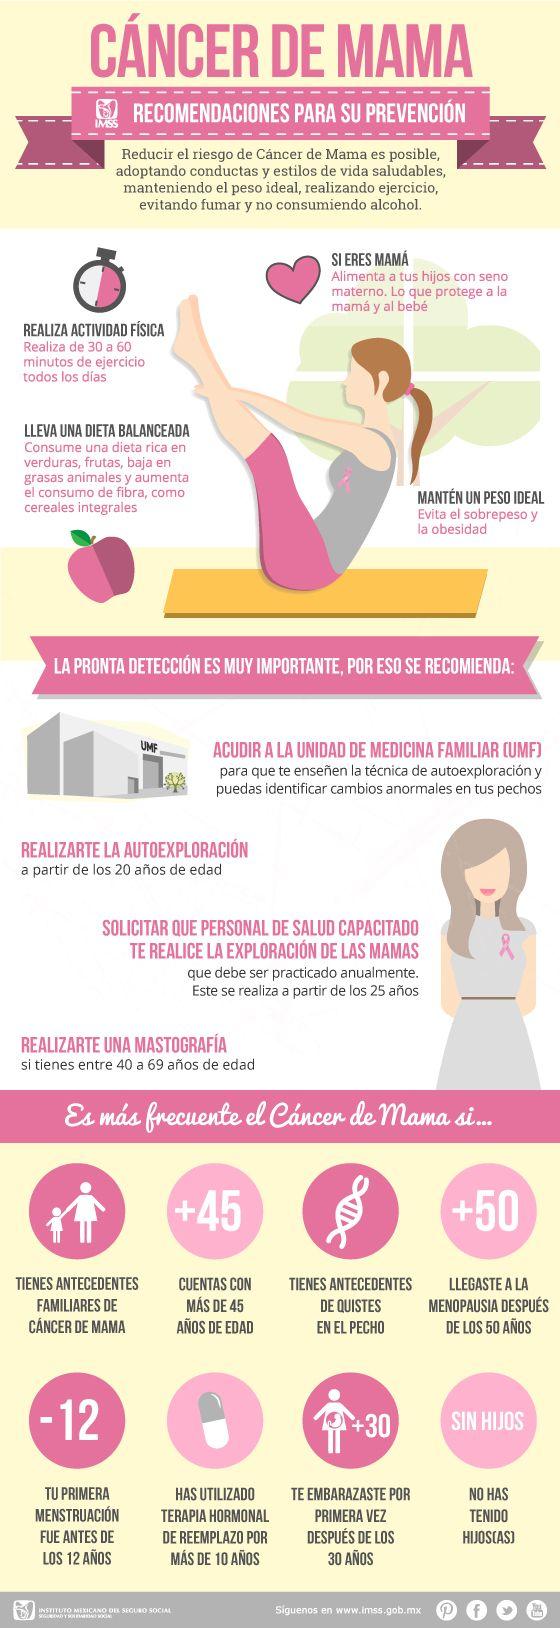 Salud and cancer on pinterest - Alimentos contra el cancer de mama ...